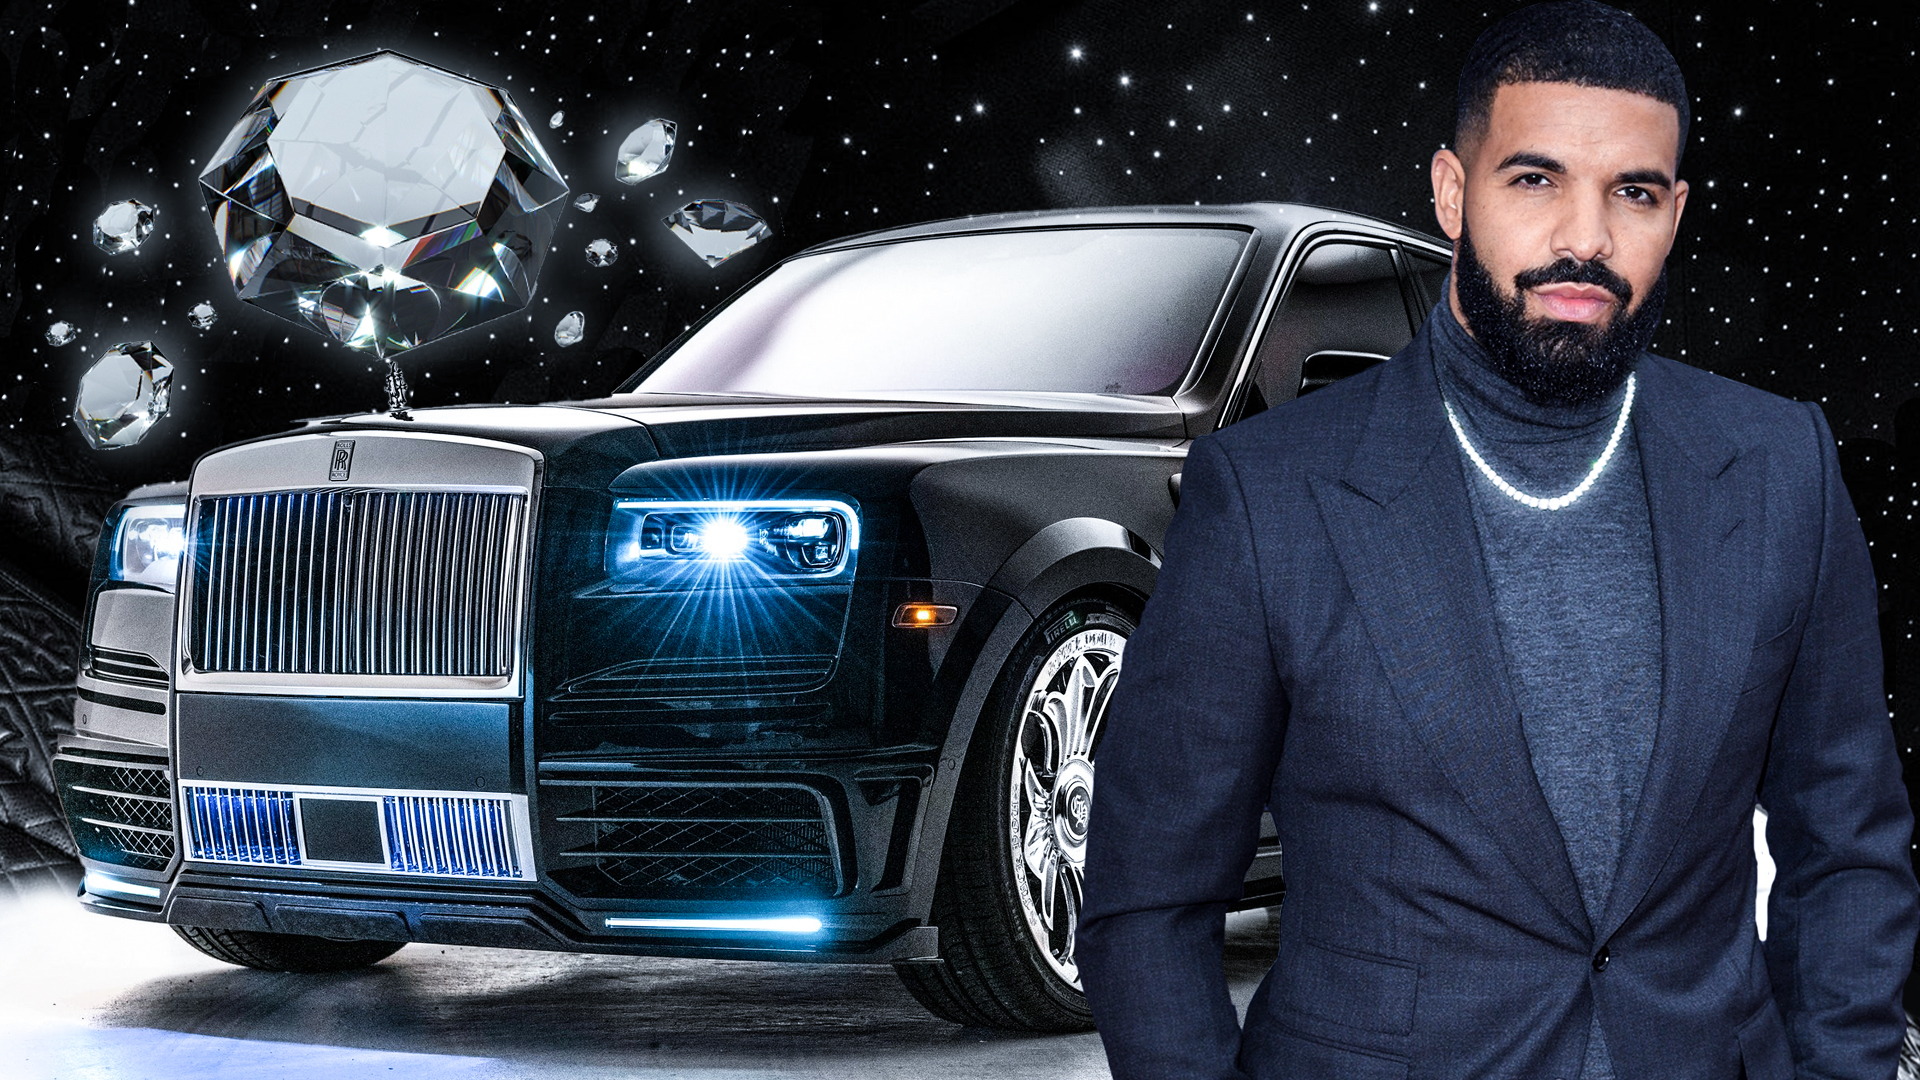 Rapper Drake e seu Rolls-Royce